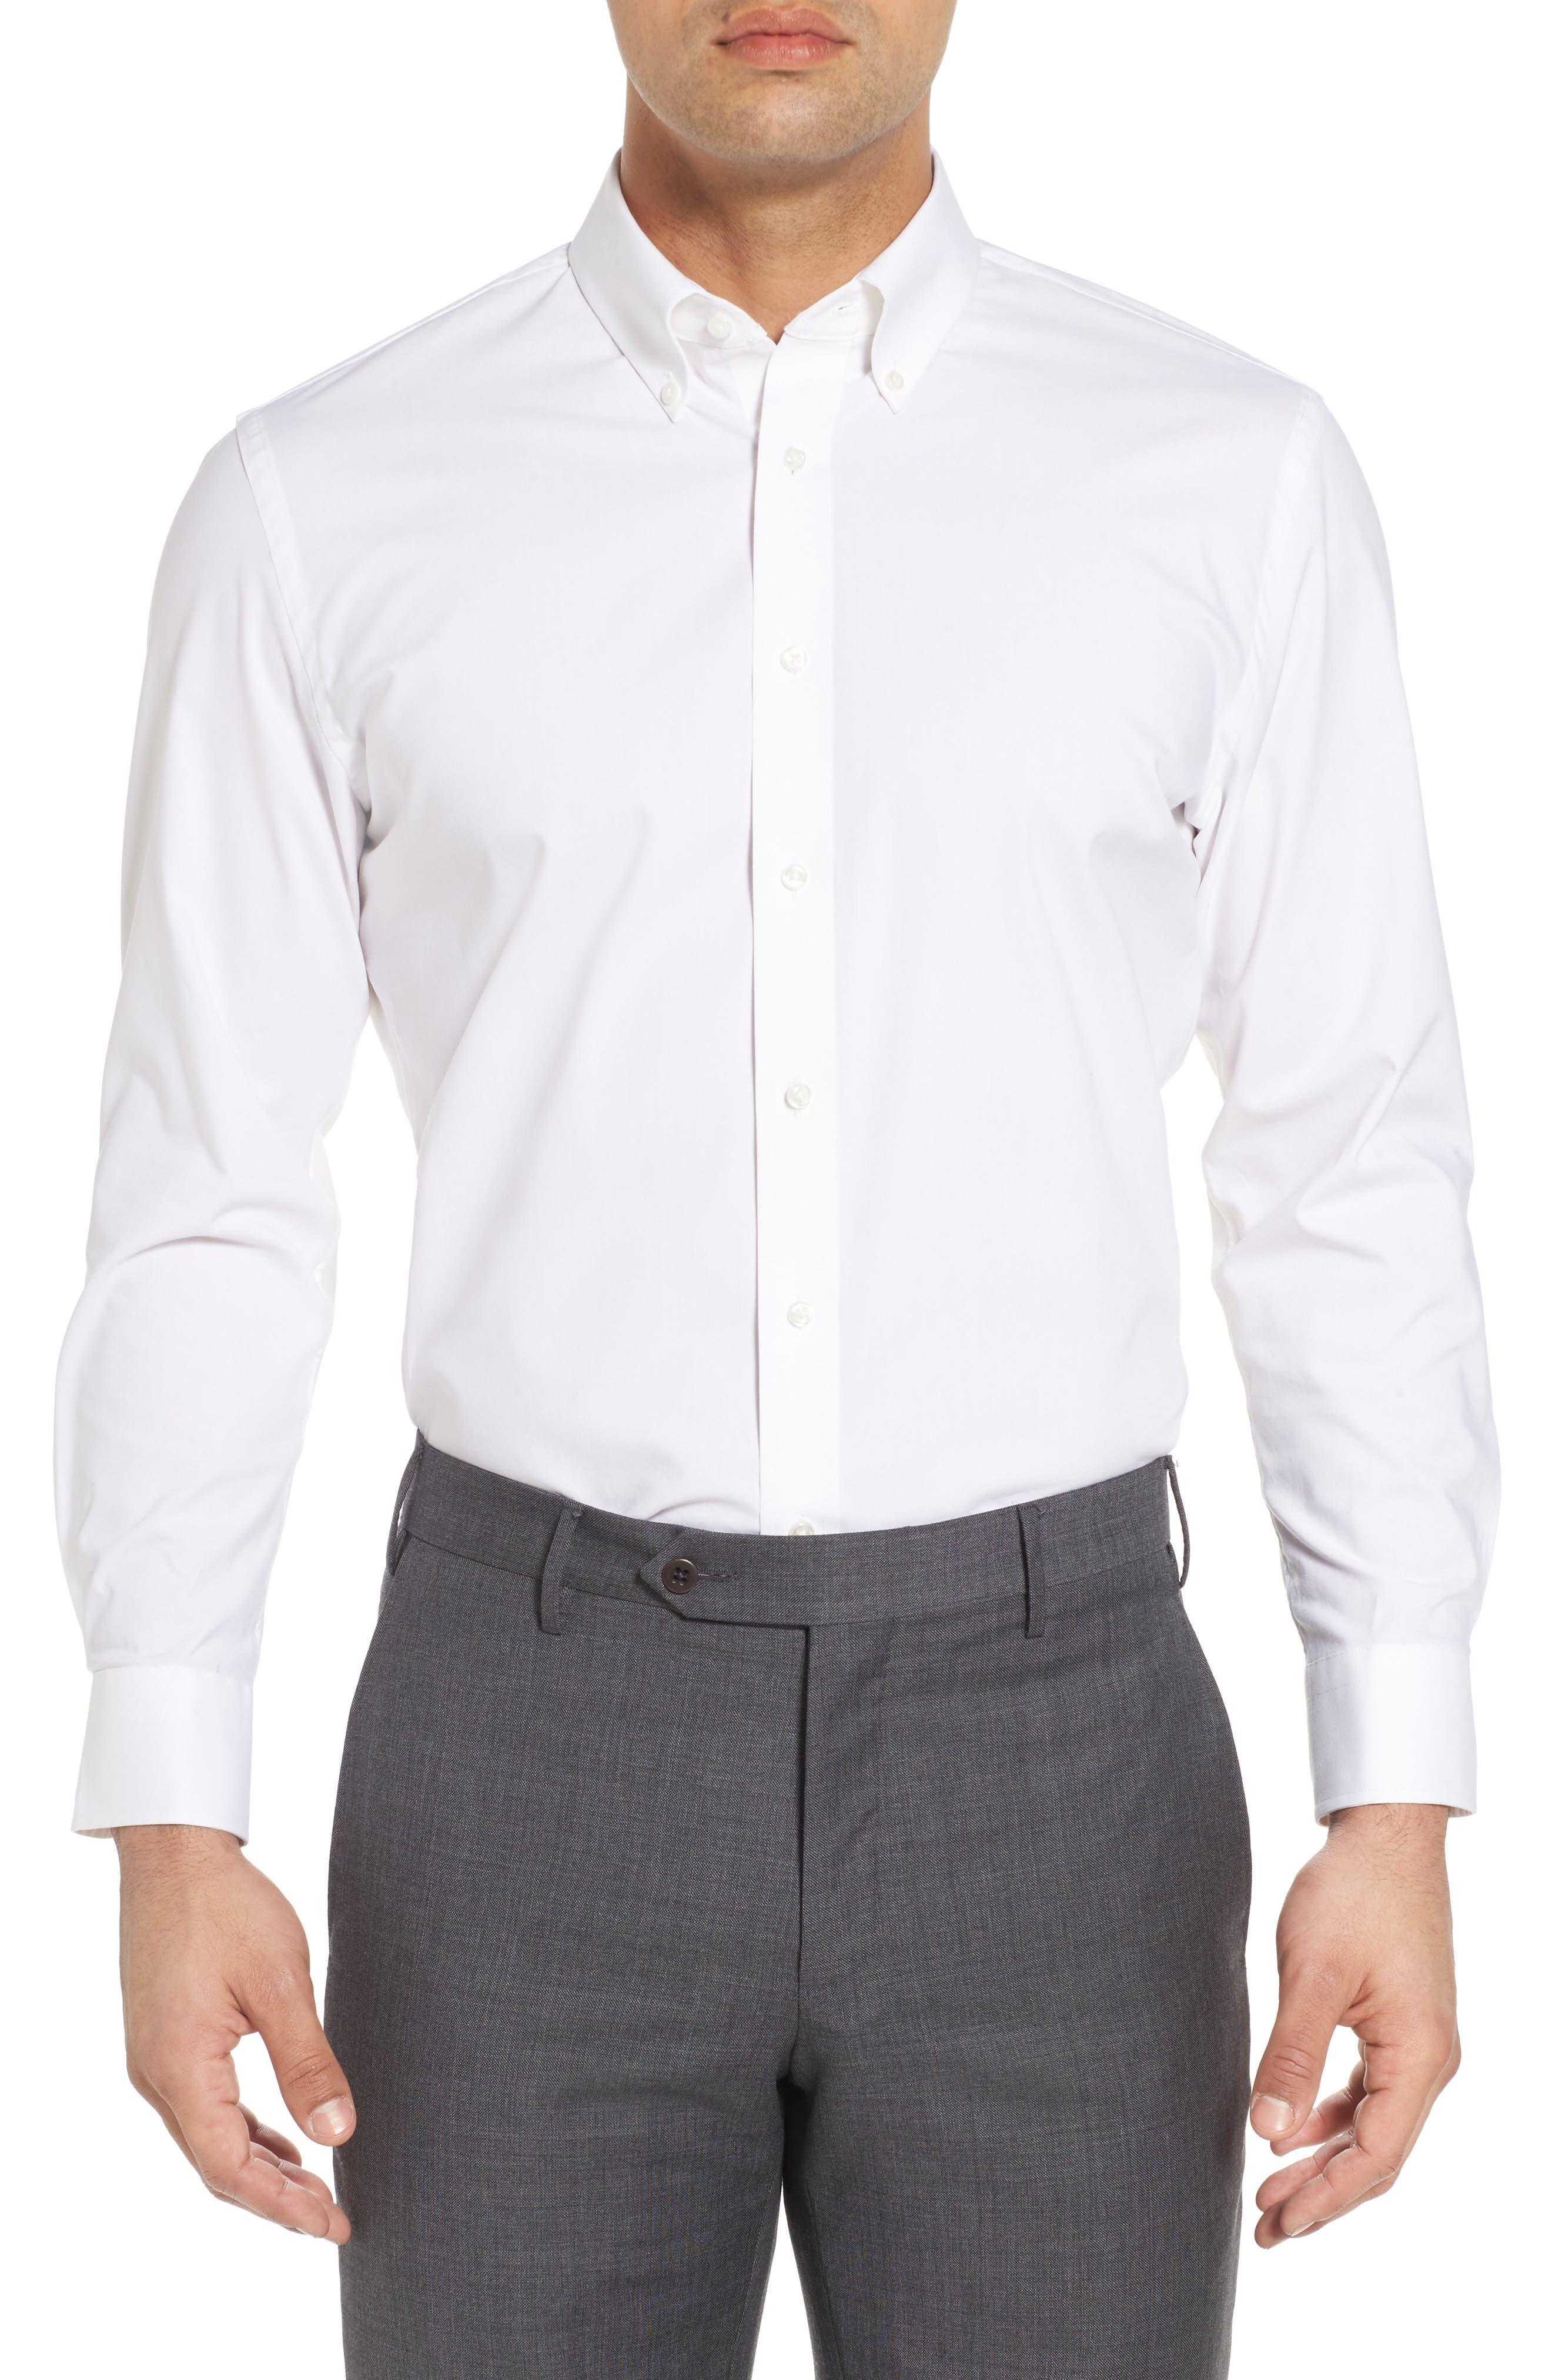 Tech-Smart Trim Fit Stretch Pinpoint Dress Shirt,                             Main thumbnail 1, color,                             WHITE